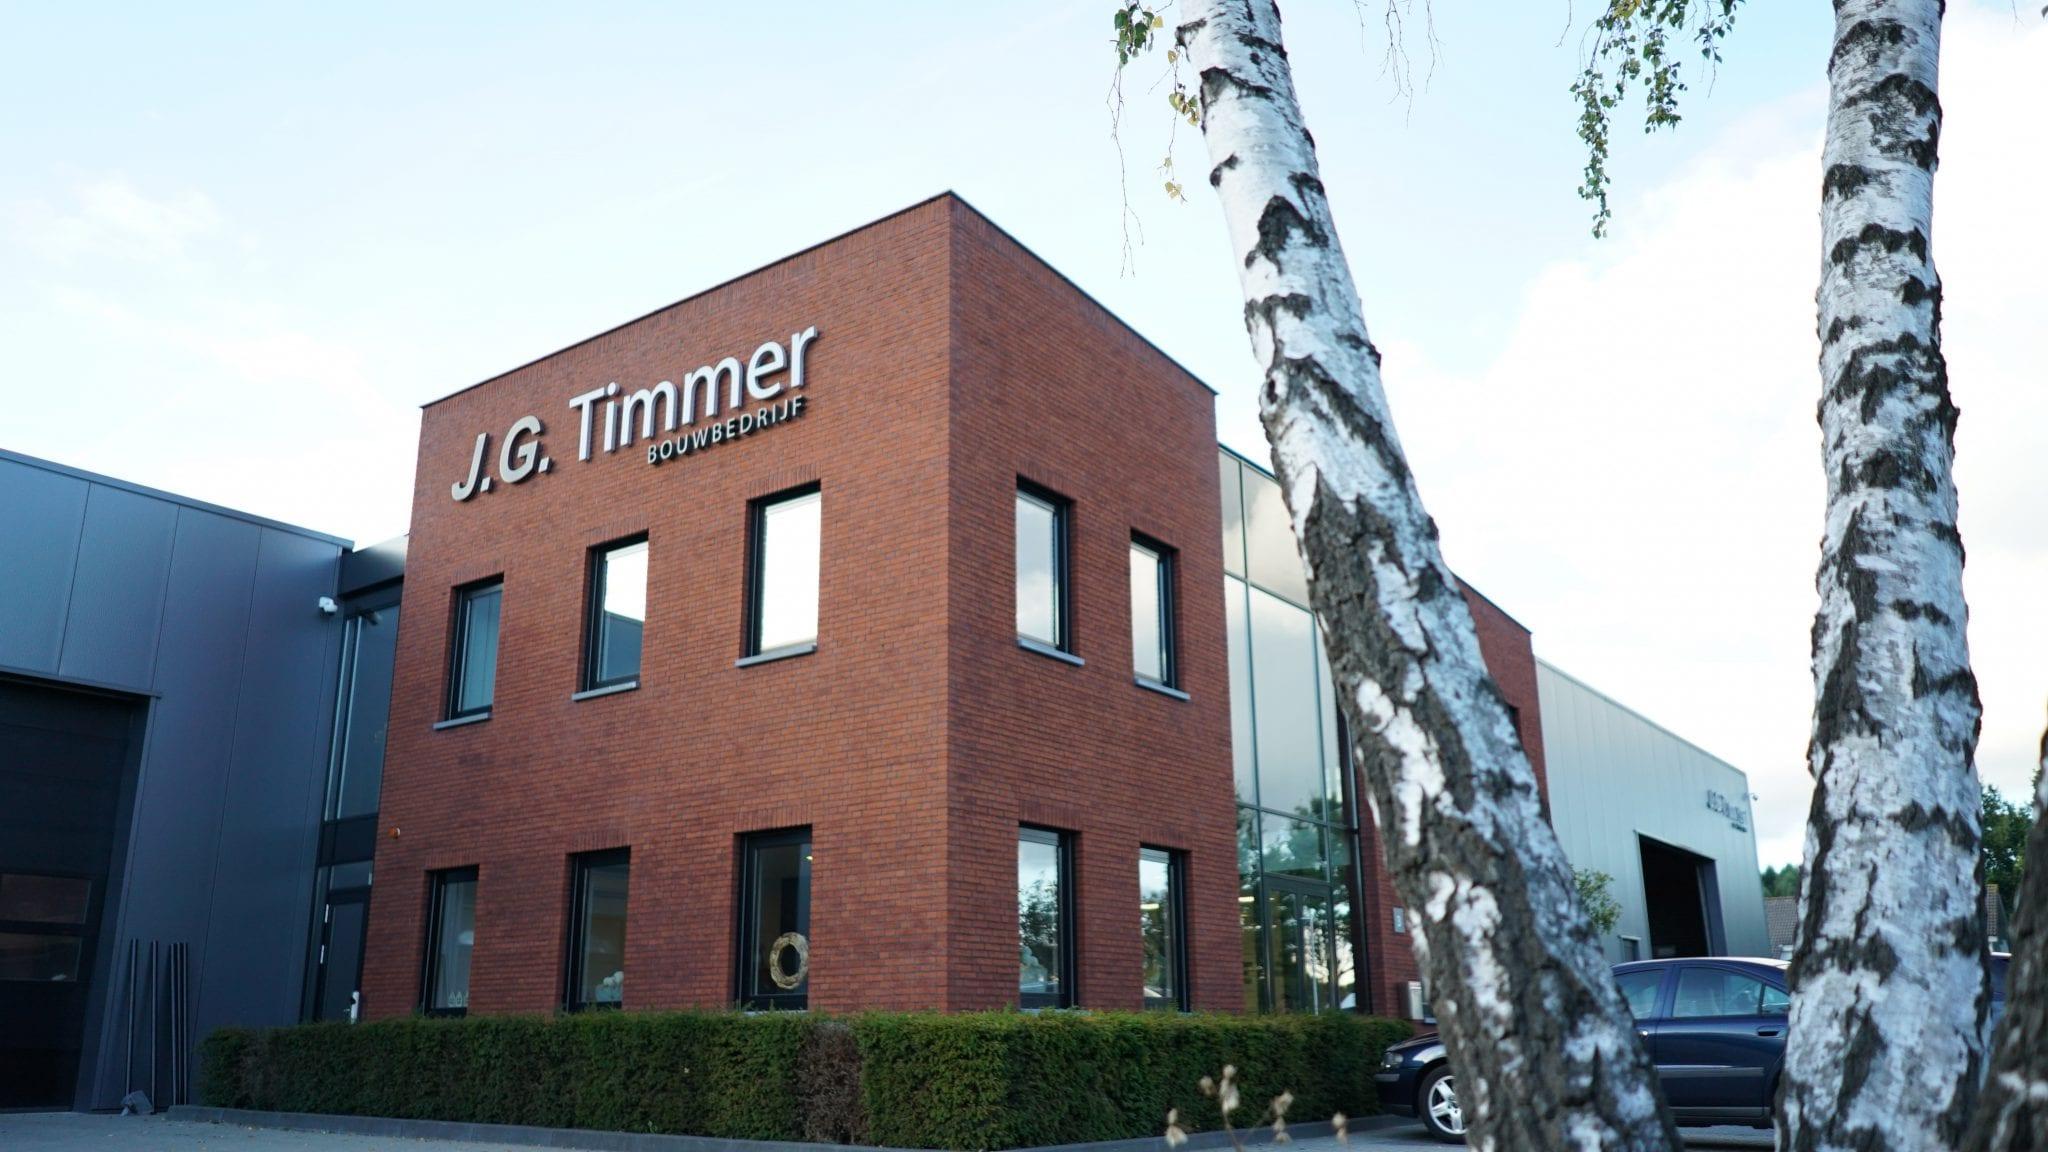 Bouwbedrijf J.G. Timmer